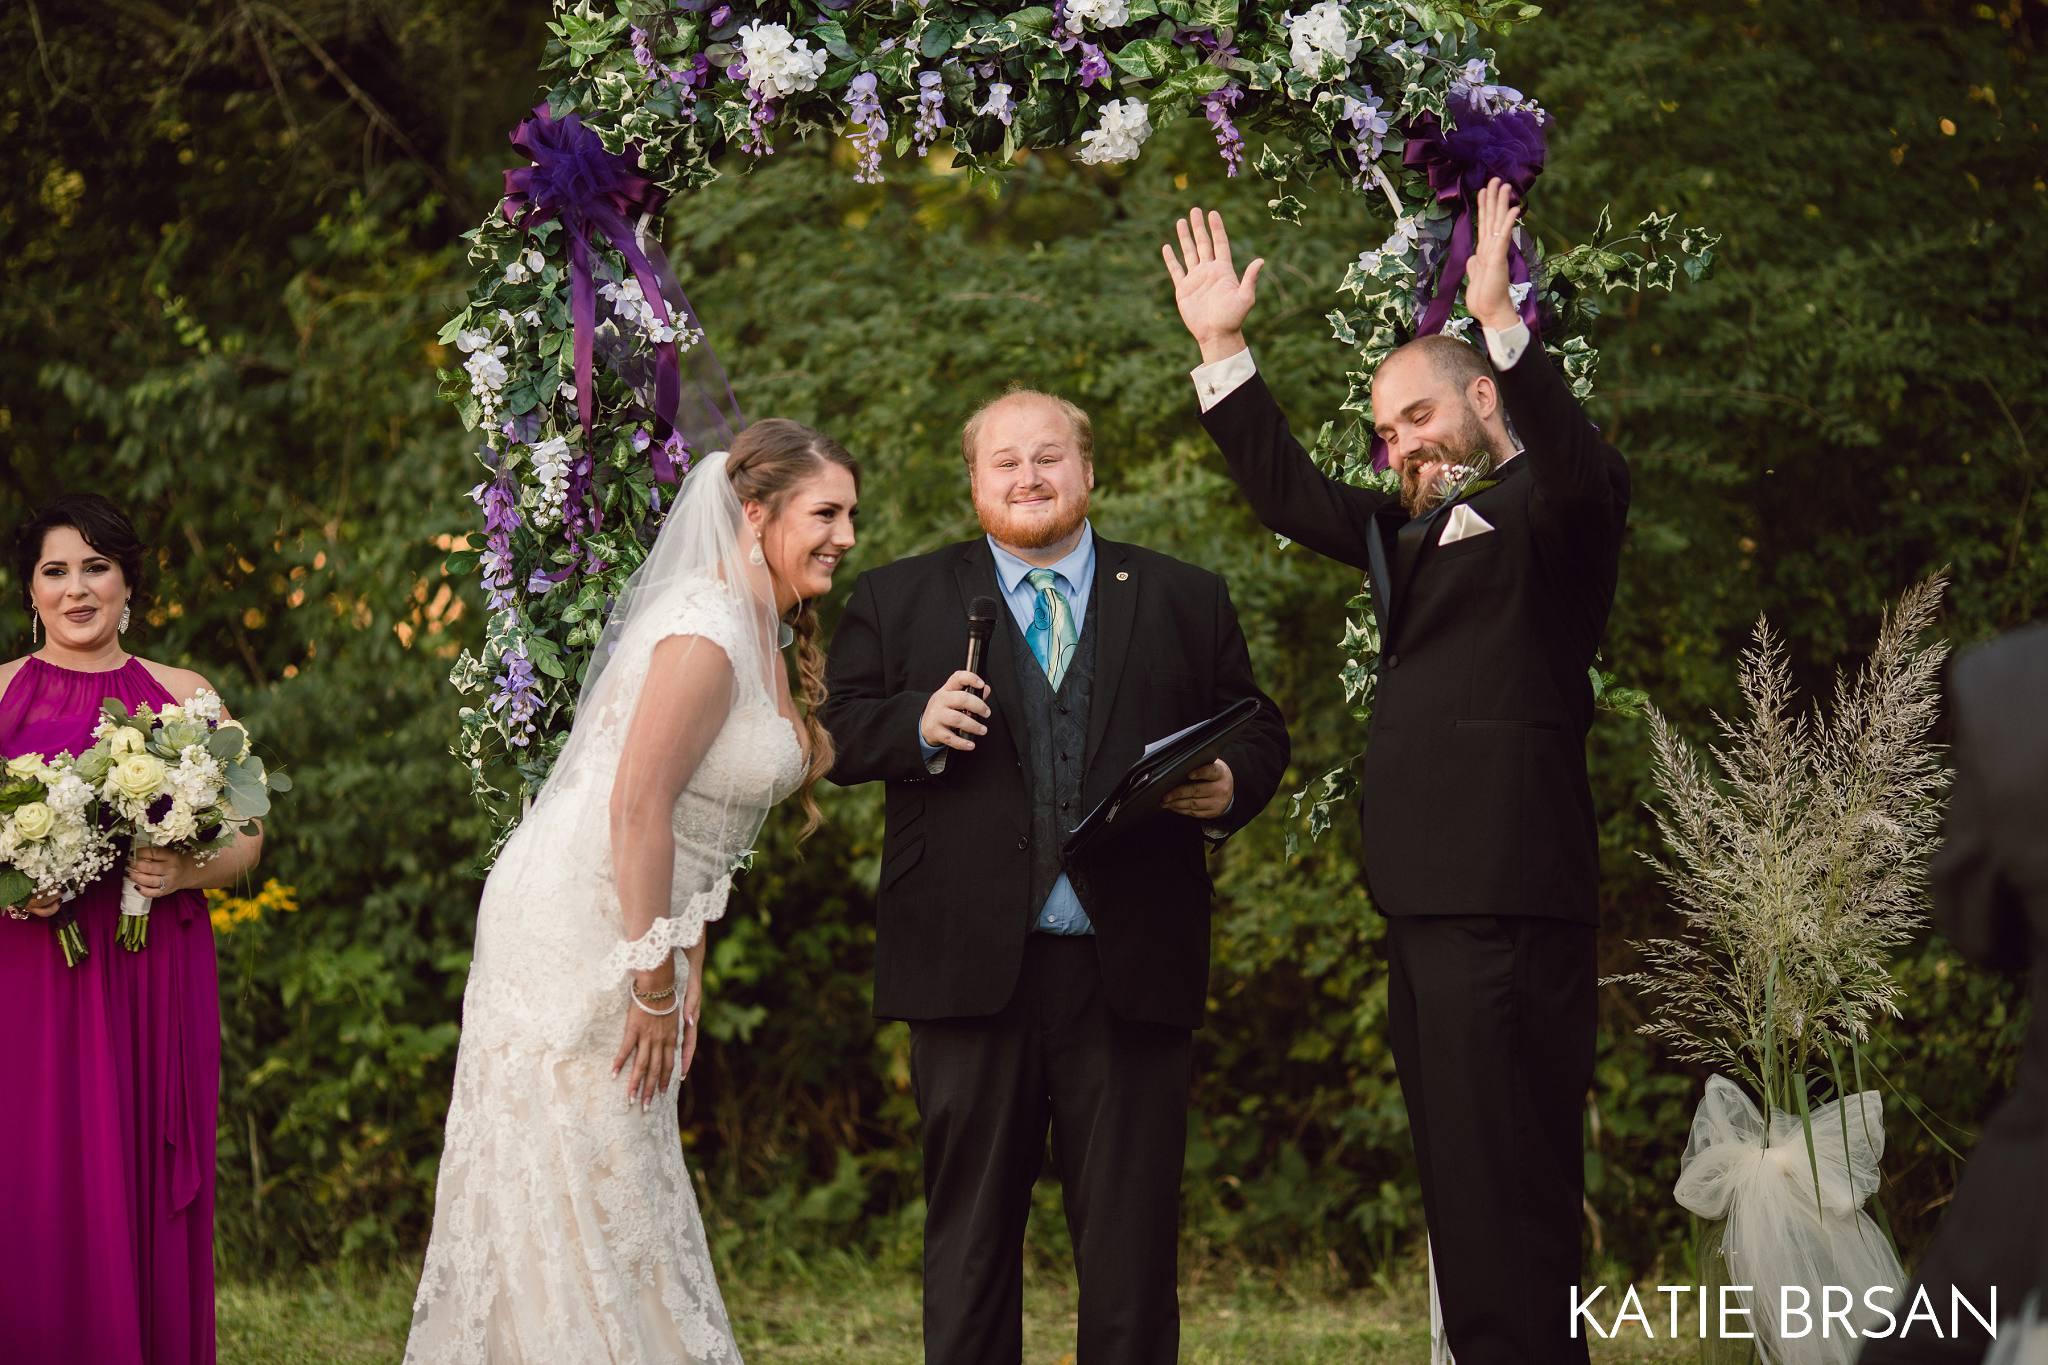 KatieBrsan-Bonfield-Backyard-Wedding_0407.jpg